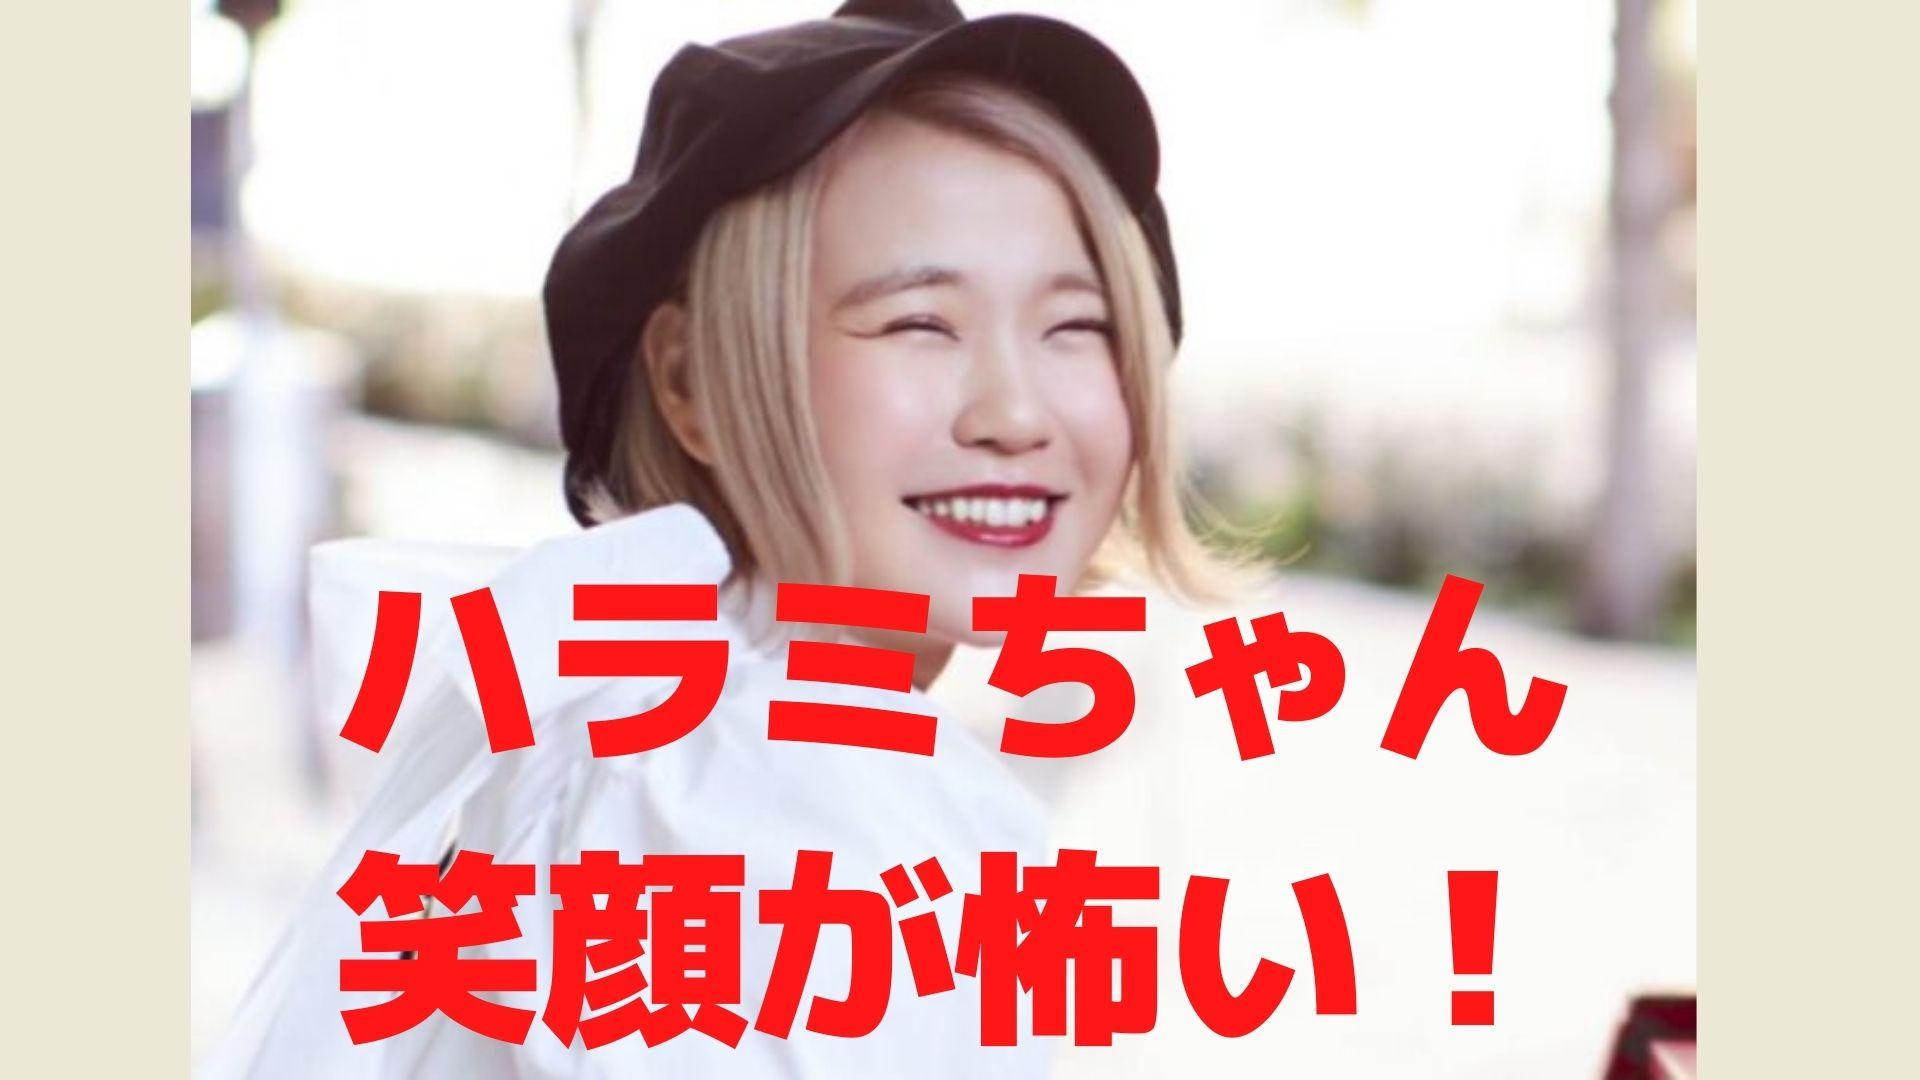 harami-chan-smile-scared